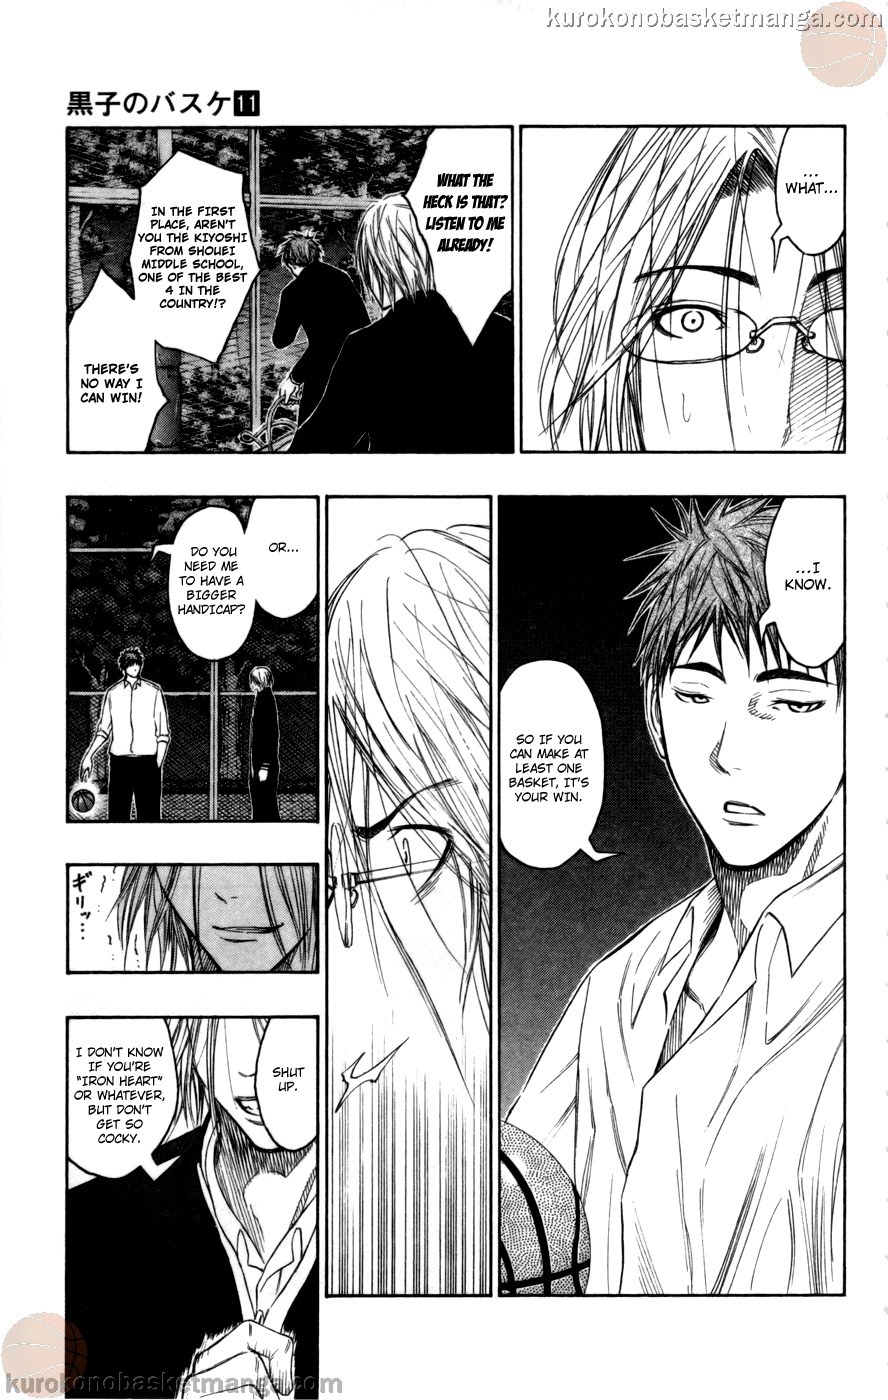 Kuroko no Basket Manga Chapter 96 - Image 13